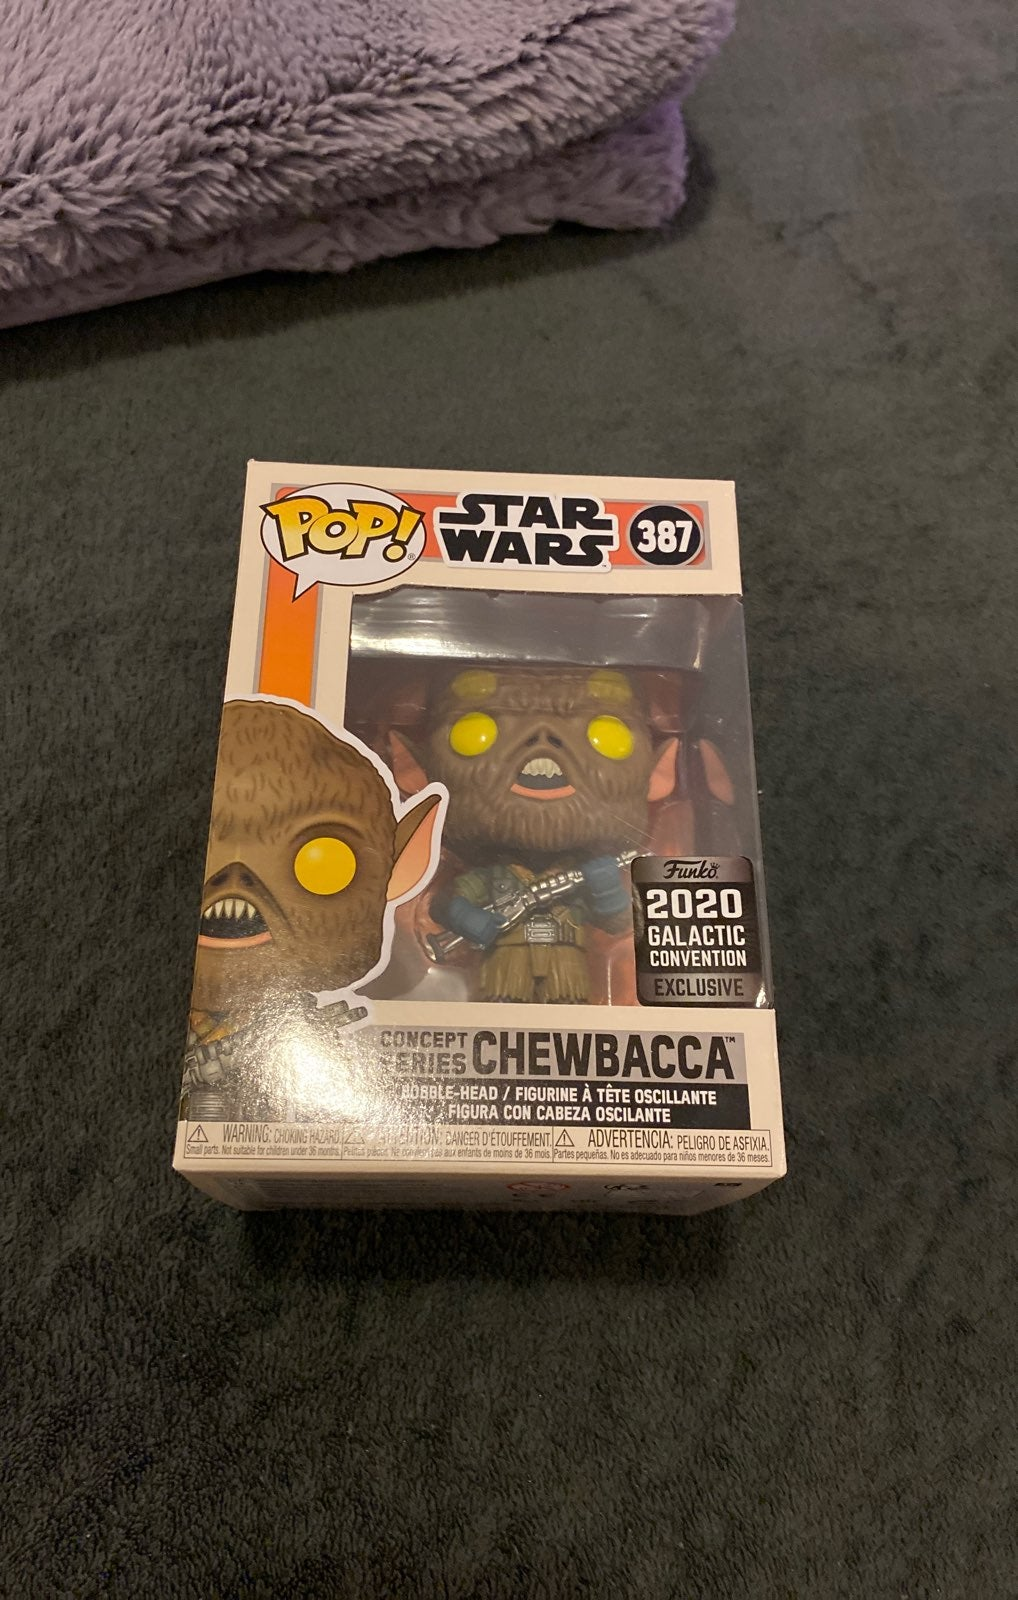 Chewbacca Concept Series Funko Pop